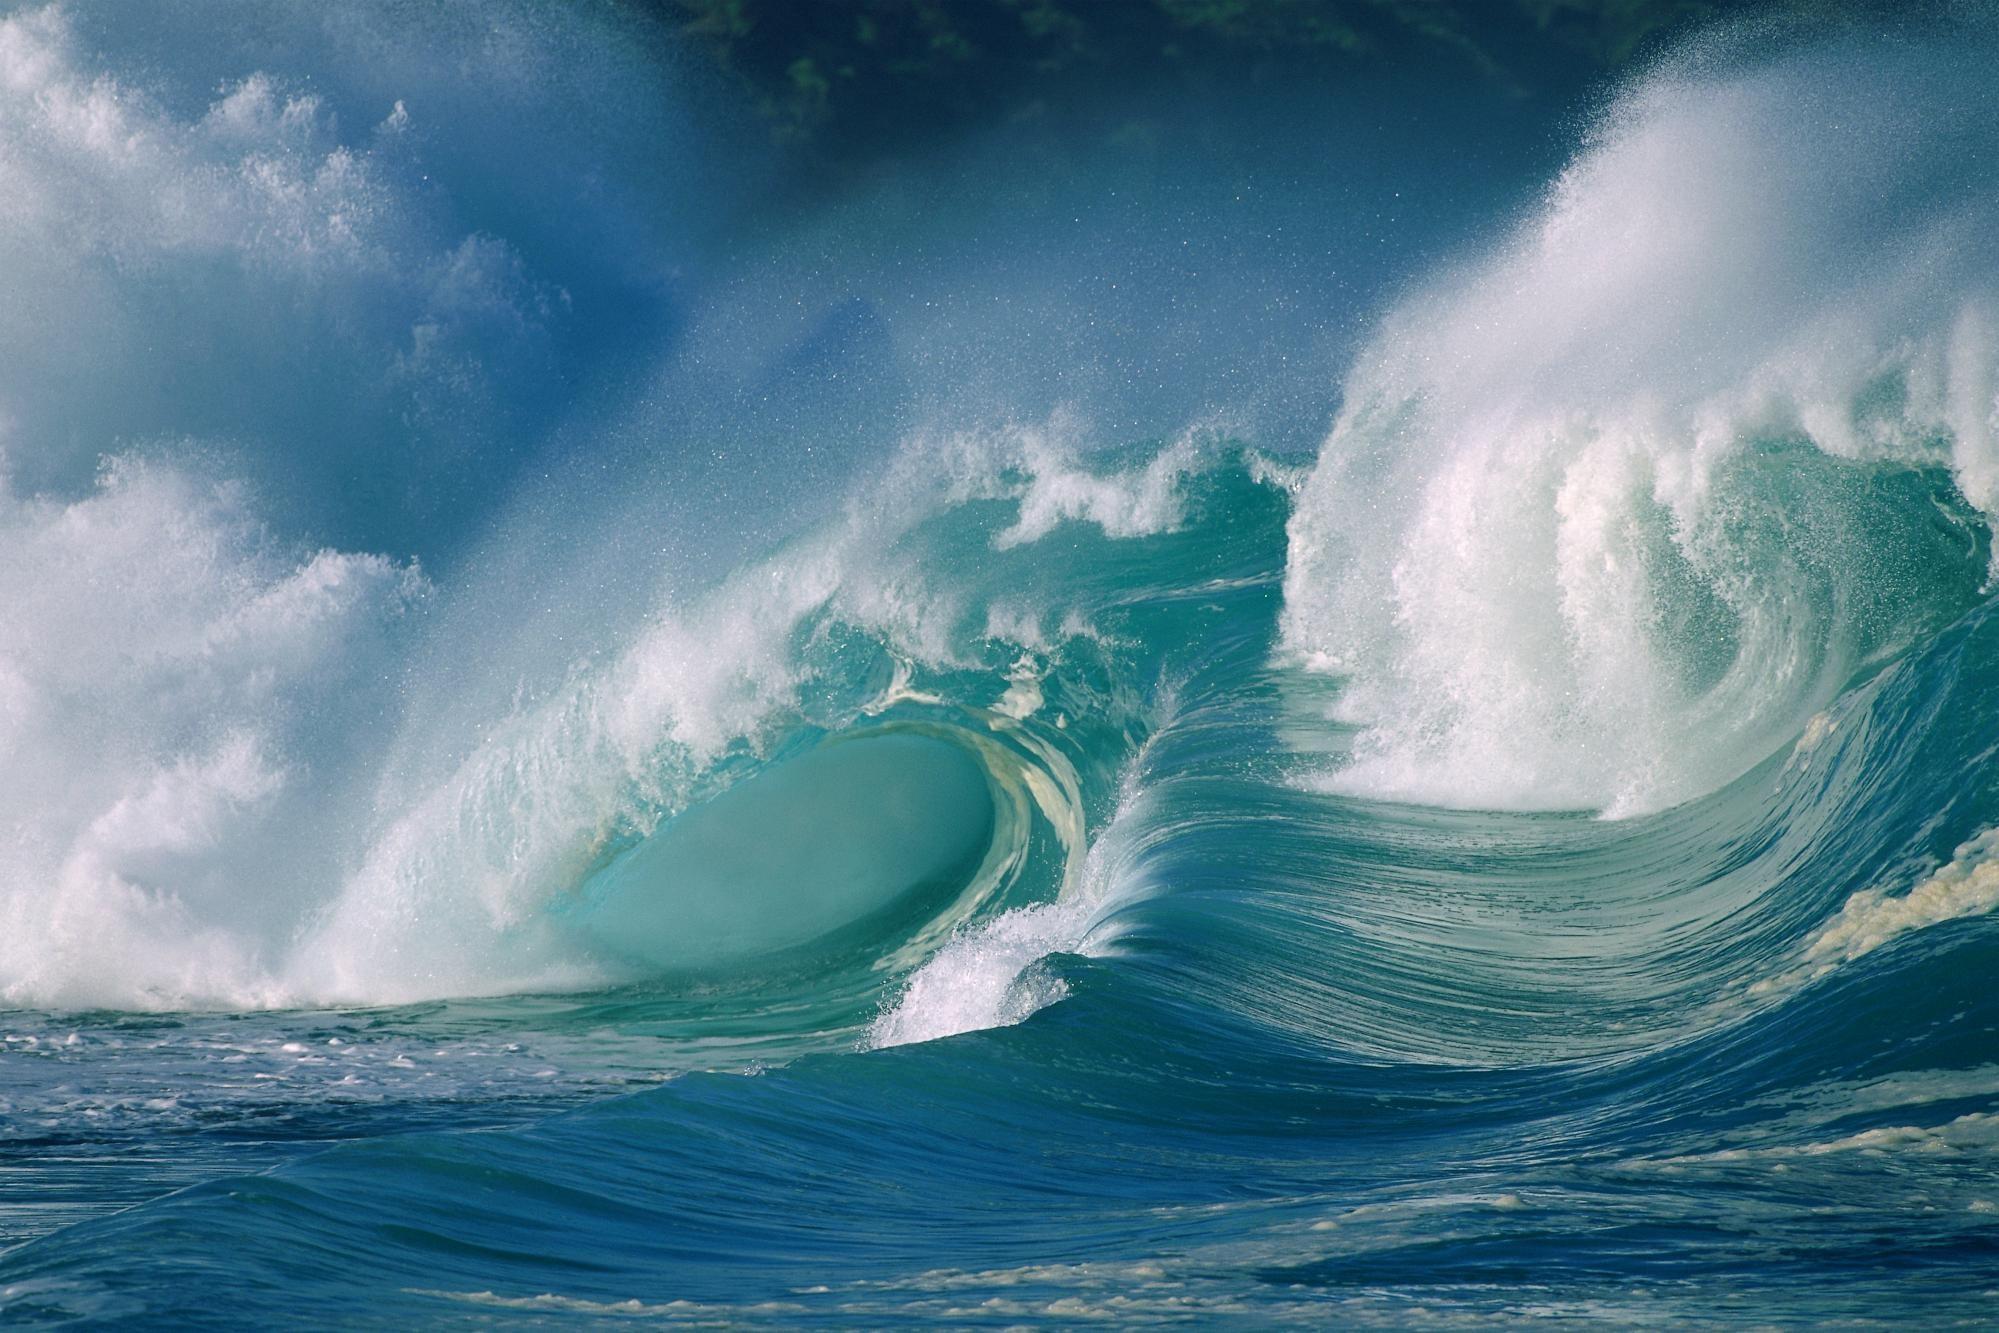 Free Ocean waves wallpaper HD.